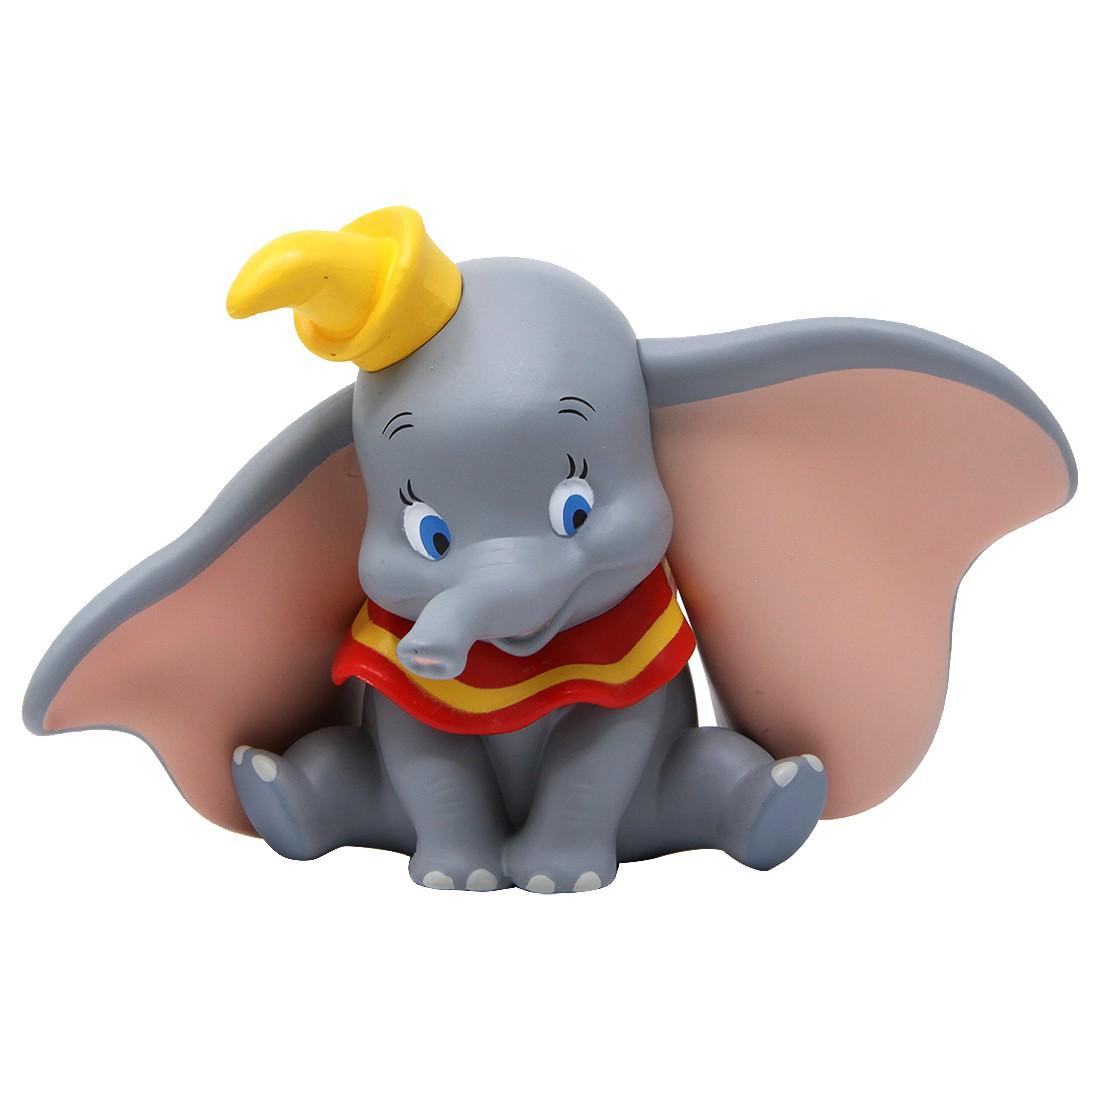 Medicom UDF Disney Series 8 Dumbo Ultra Detail Figure (gray)